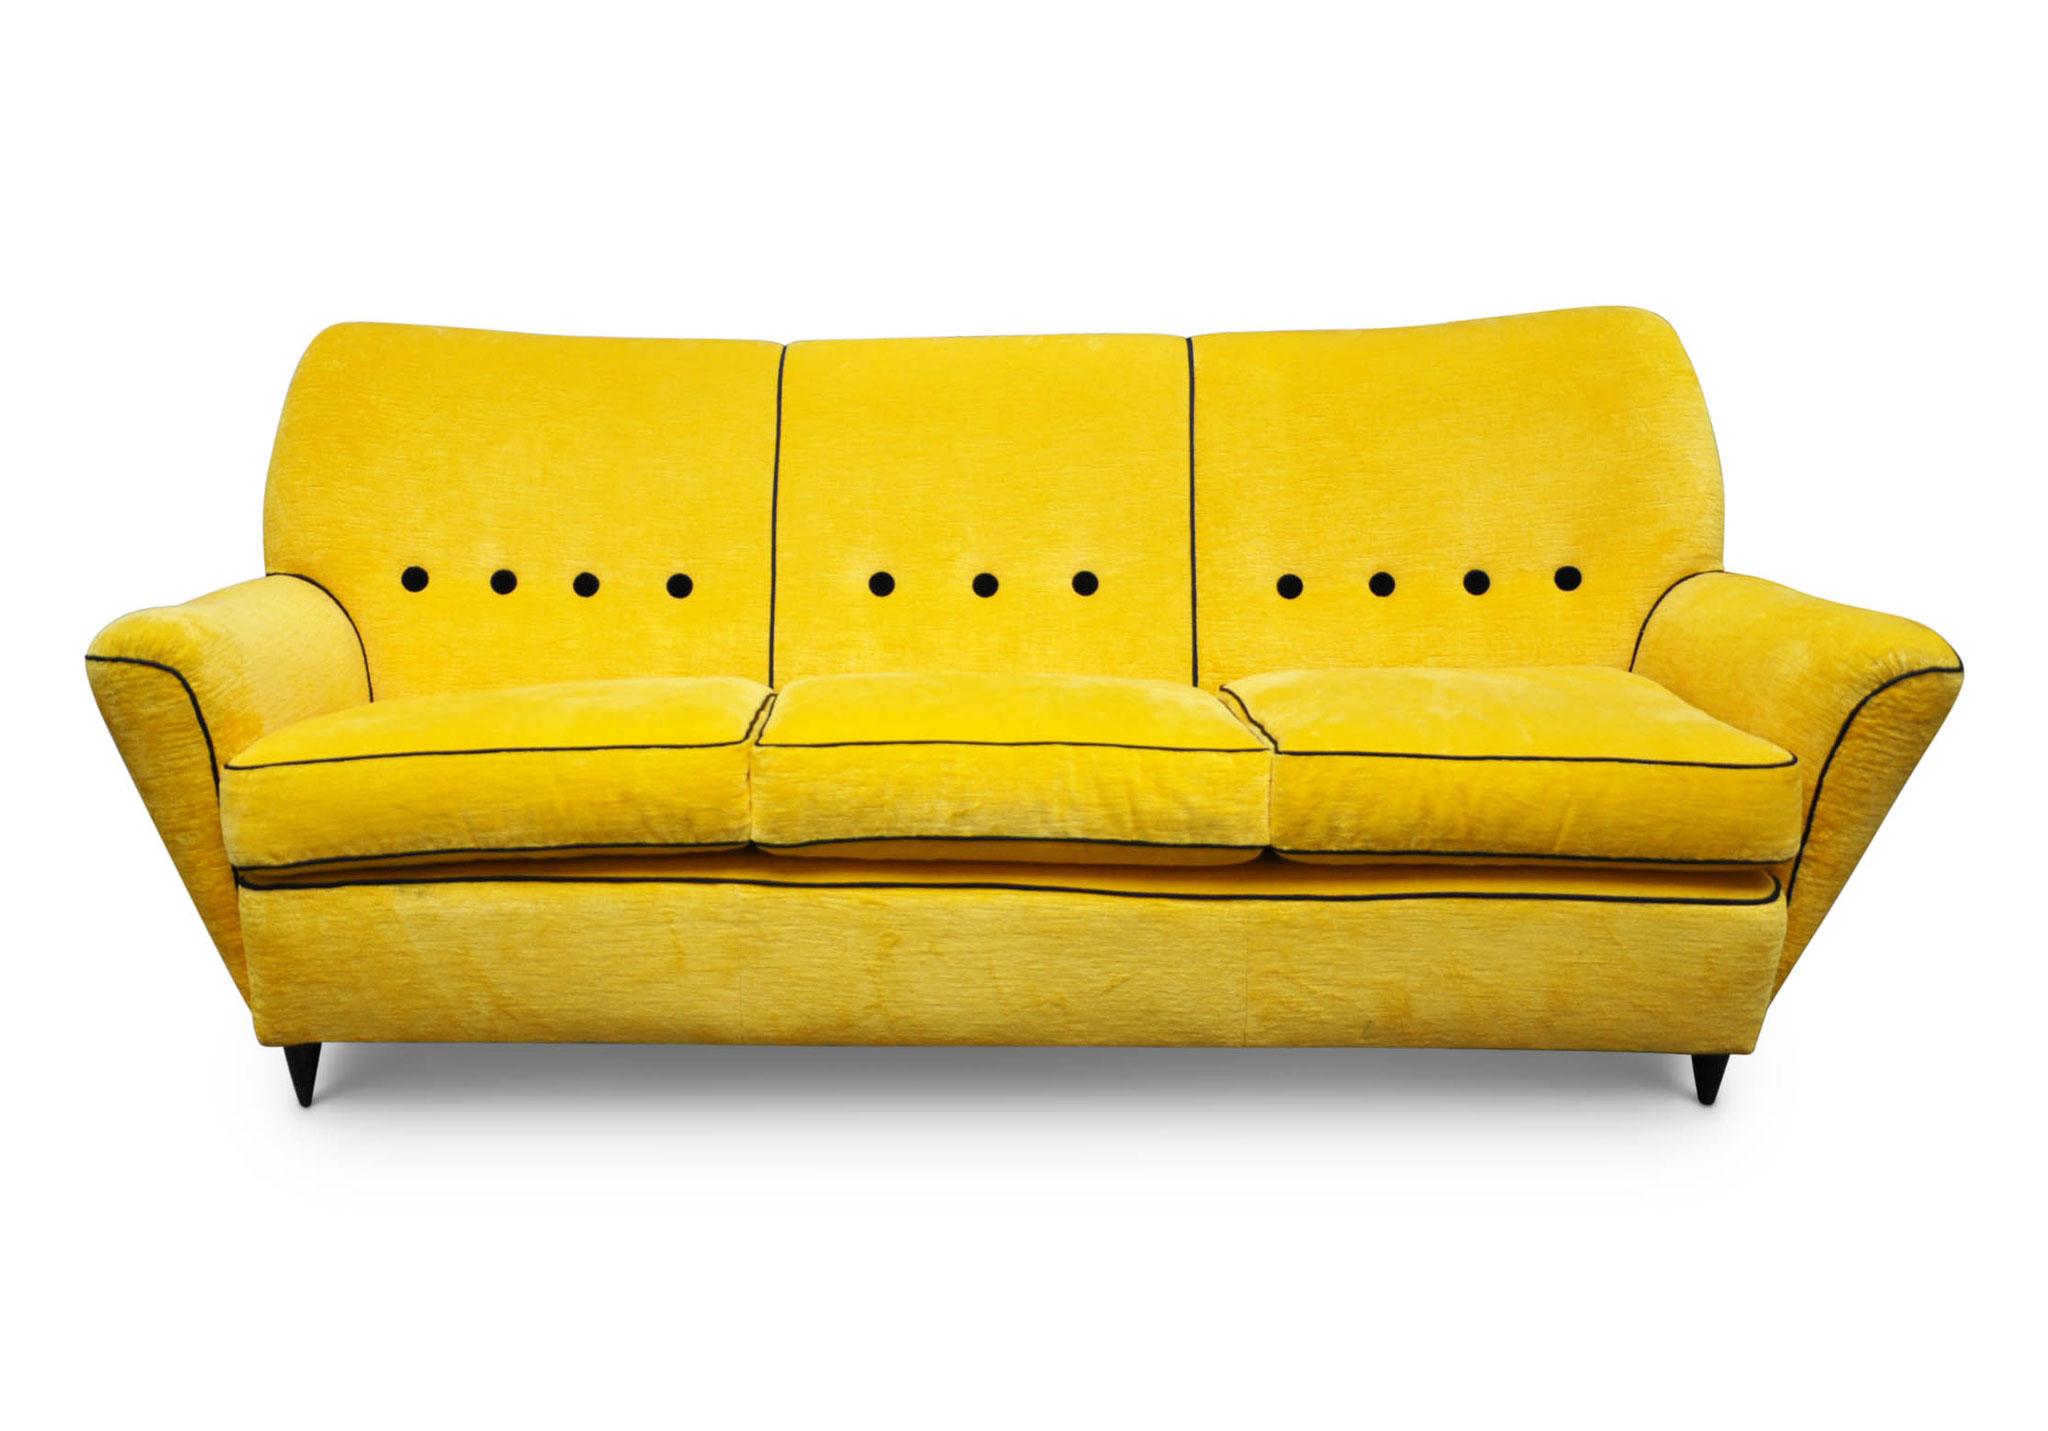 Divano vintage sofa 1959 italian vintage sofa for Divano anni 50